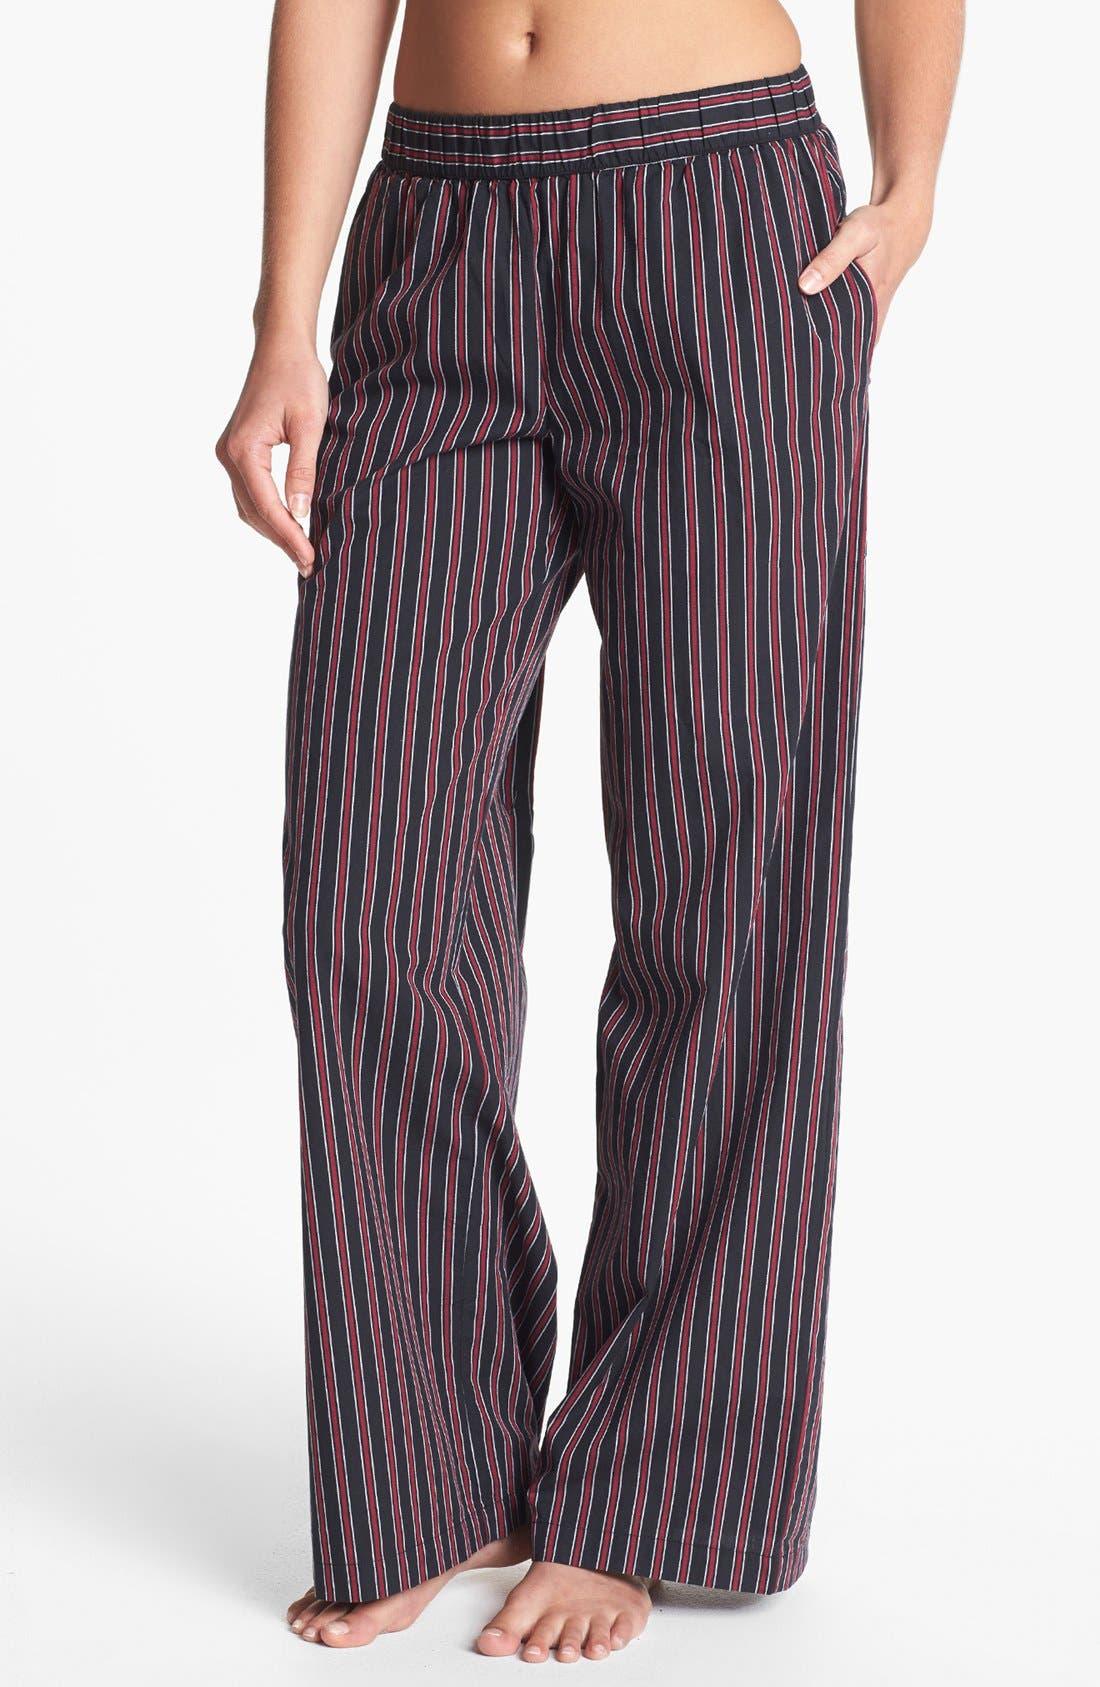 Alternate Image 1 Selected - Shimera Stripe Lounge Pants